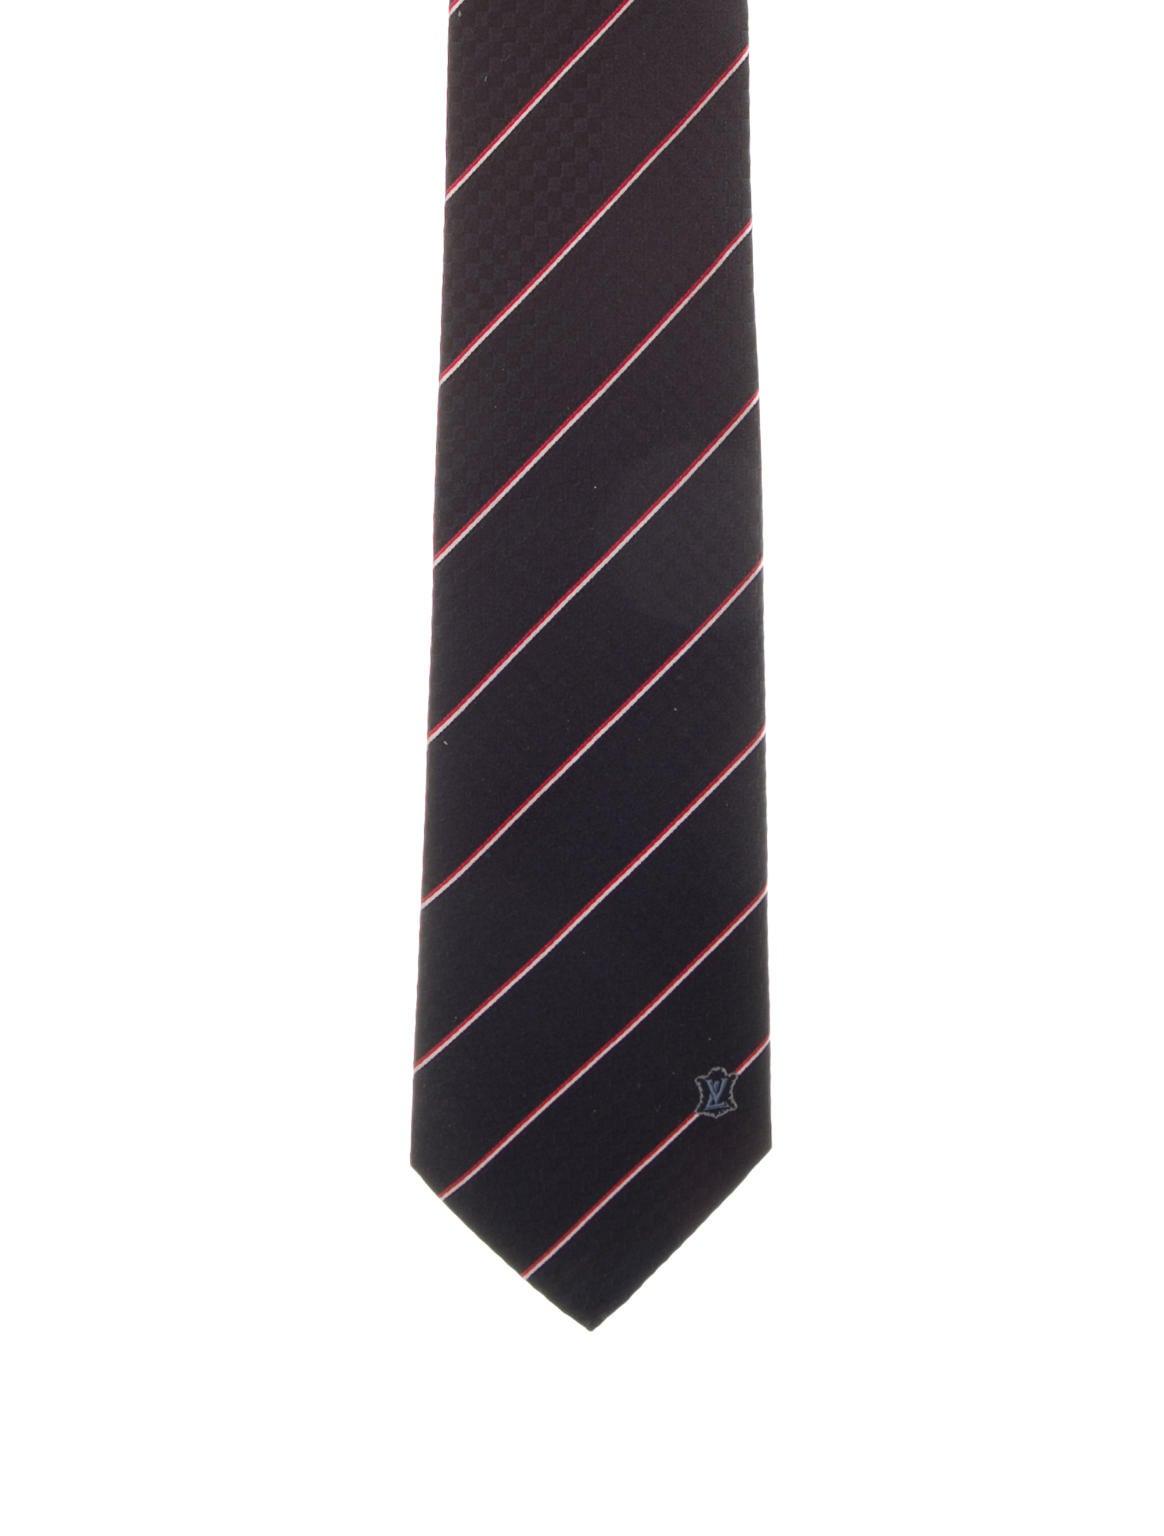 louis vuitton damier silk tie w tags suiting